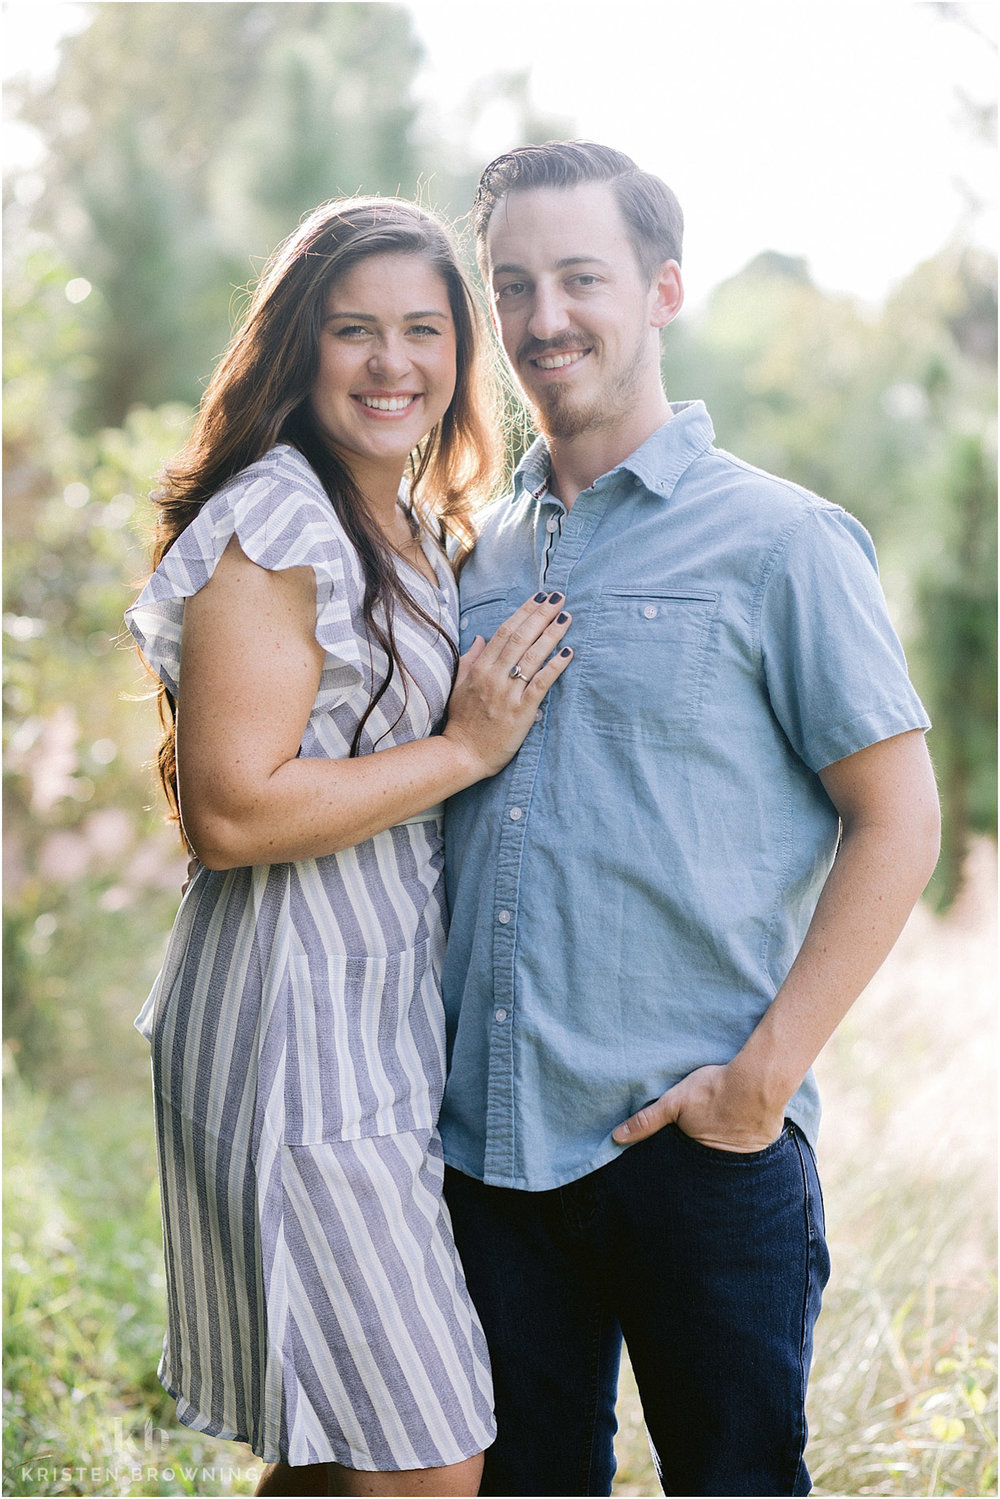 Engagement photo inspiration in Stuart FL